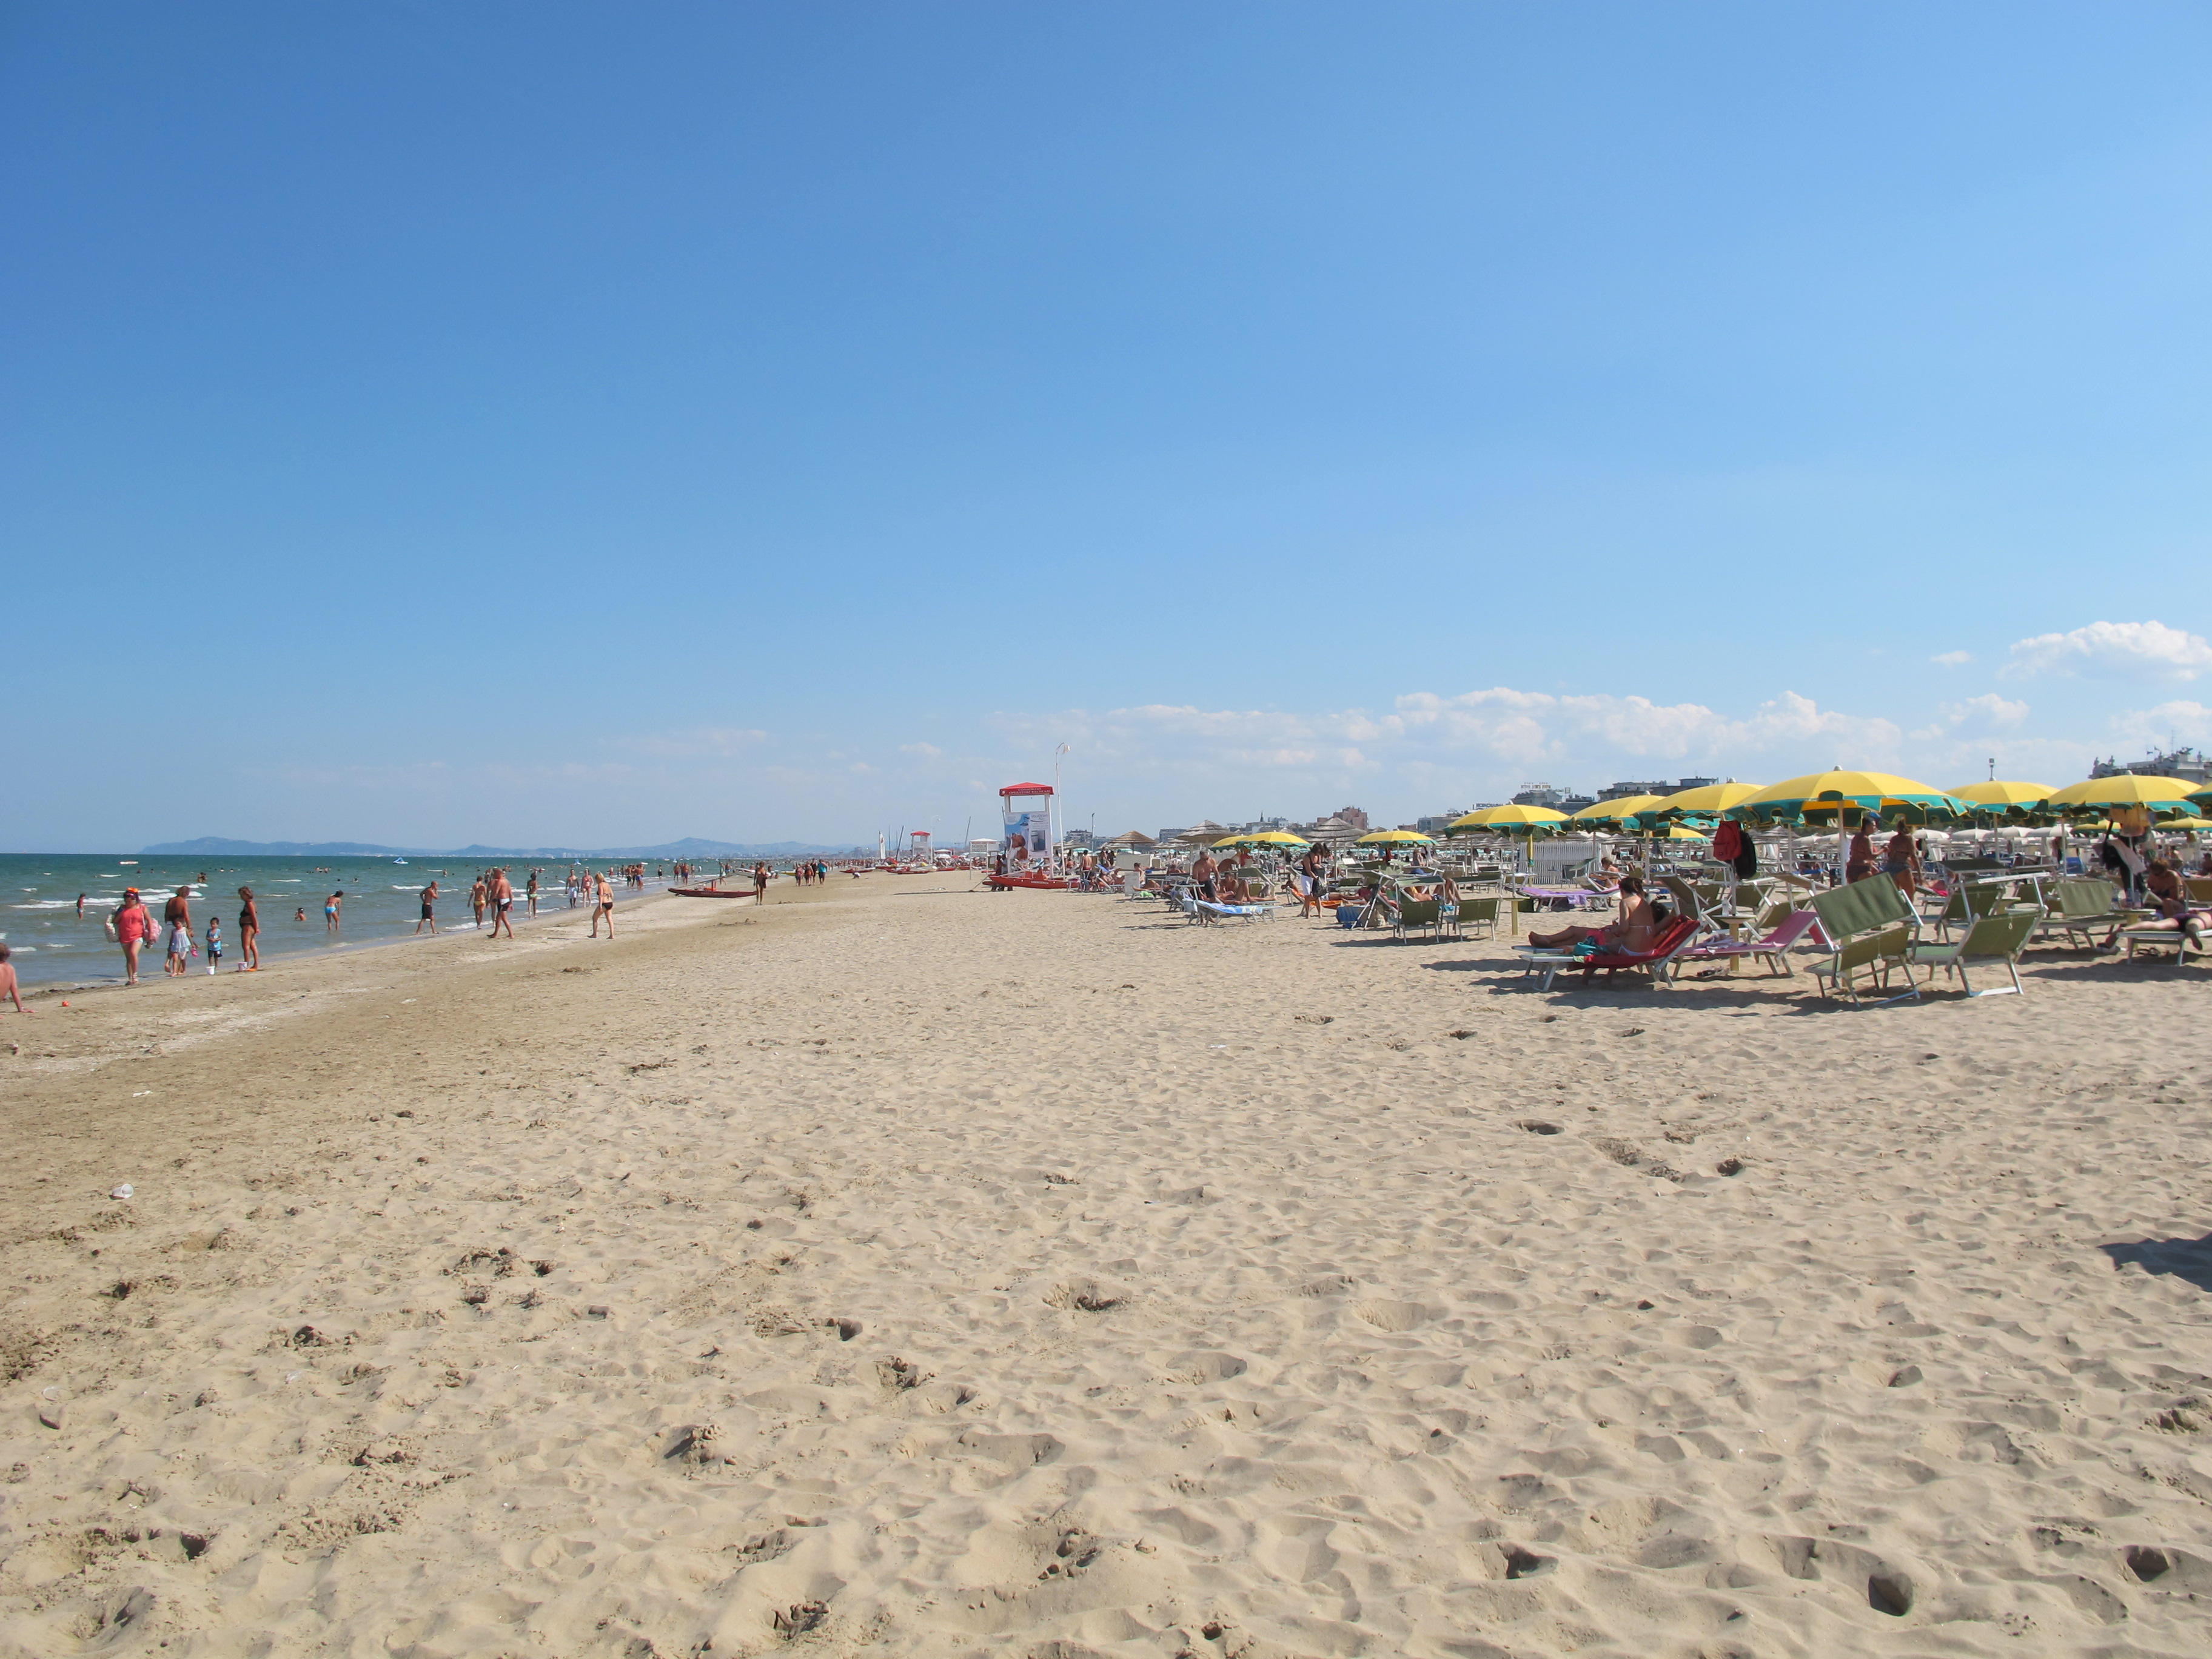 Matrimonio Sulla Spiaggia Emilia Romagna : Ferragosto last minute — idealista news